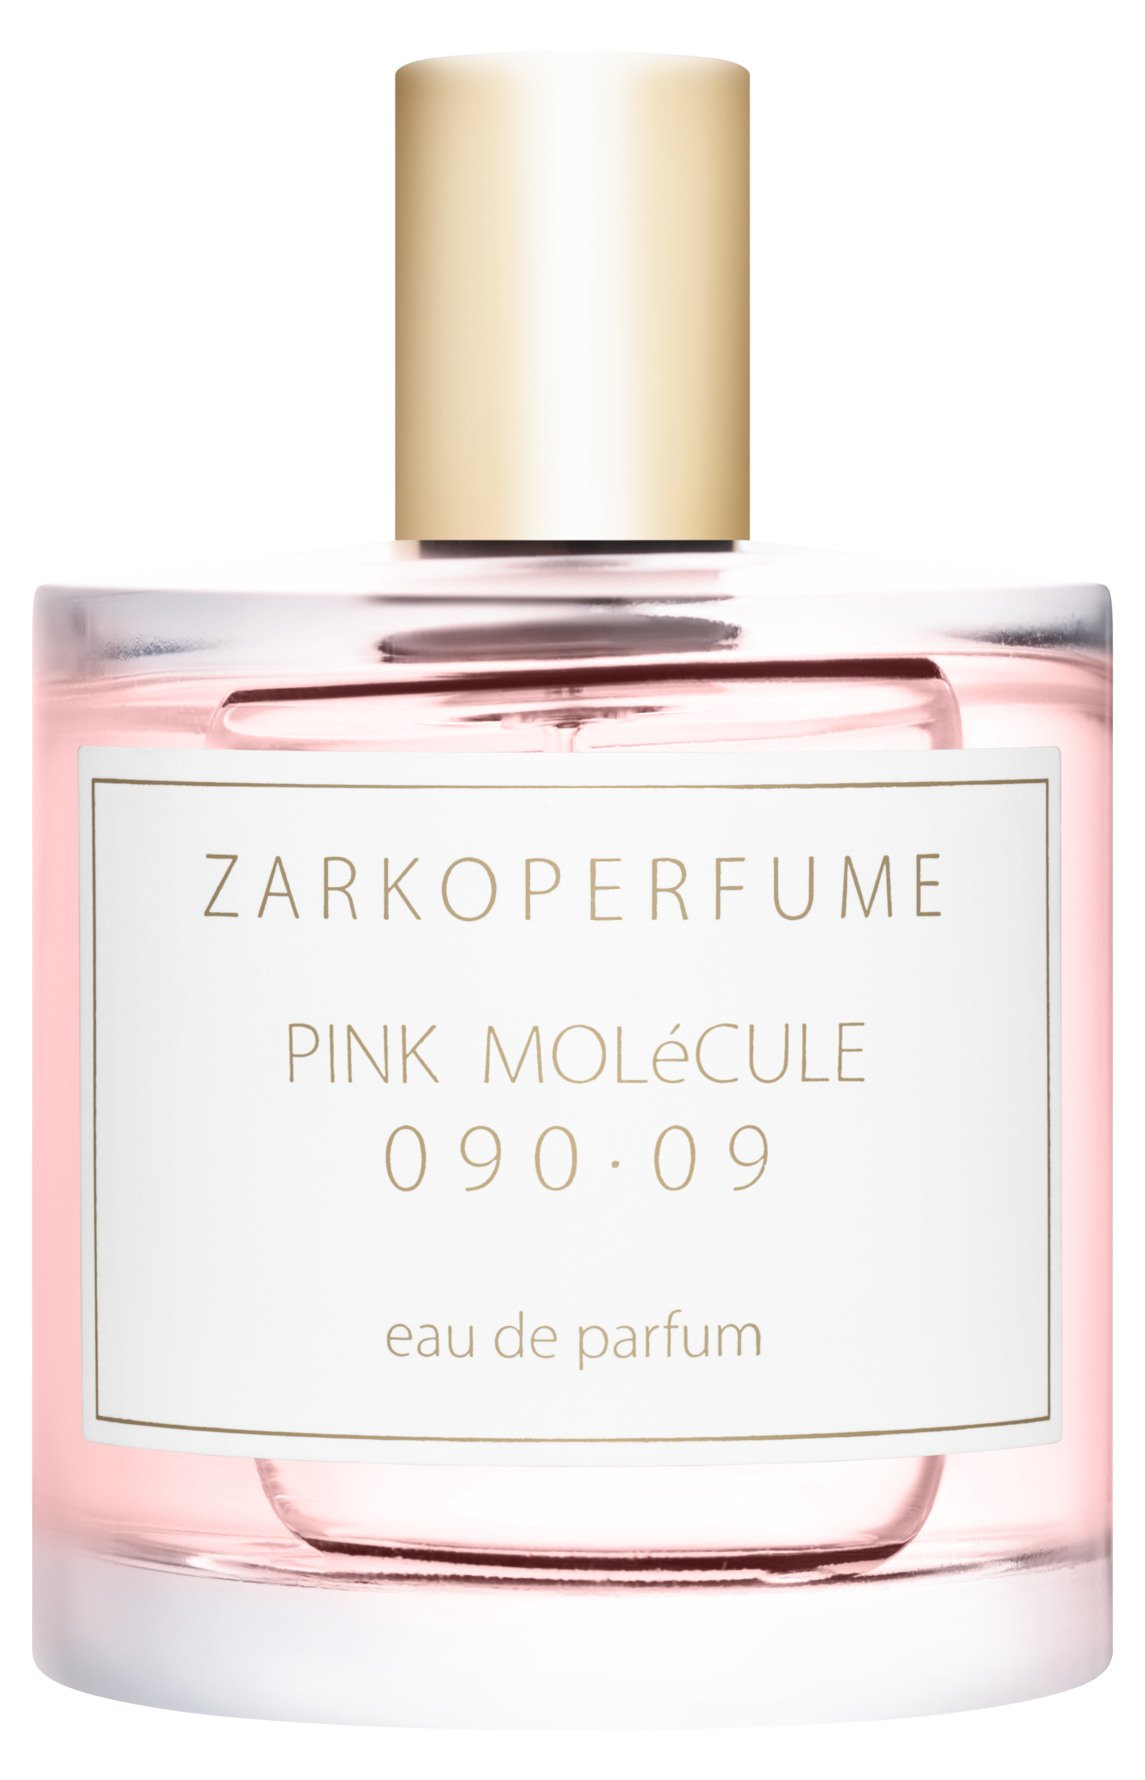 Köp ZARKOPERFUME PINK MOLéCULE 090•09 EDP 100ml inkl. frakt